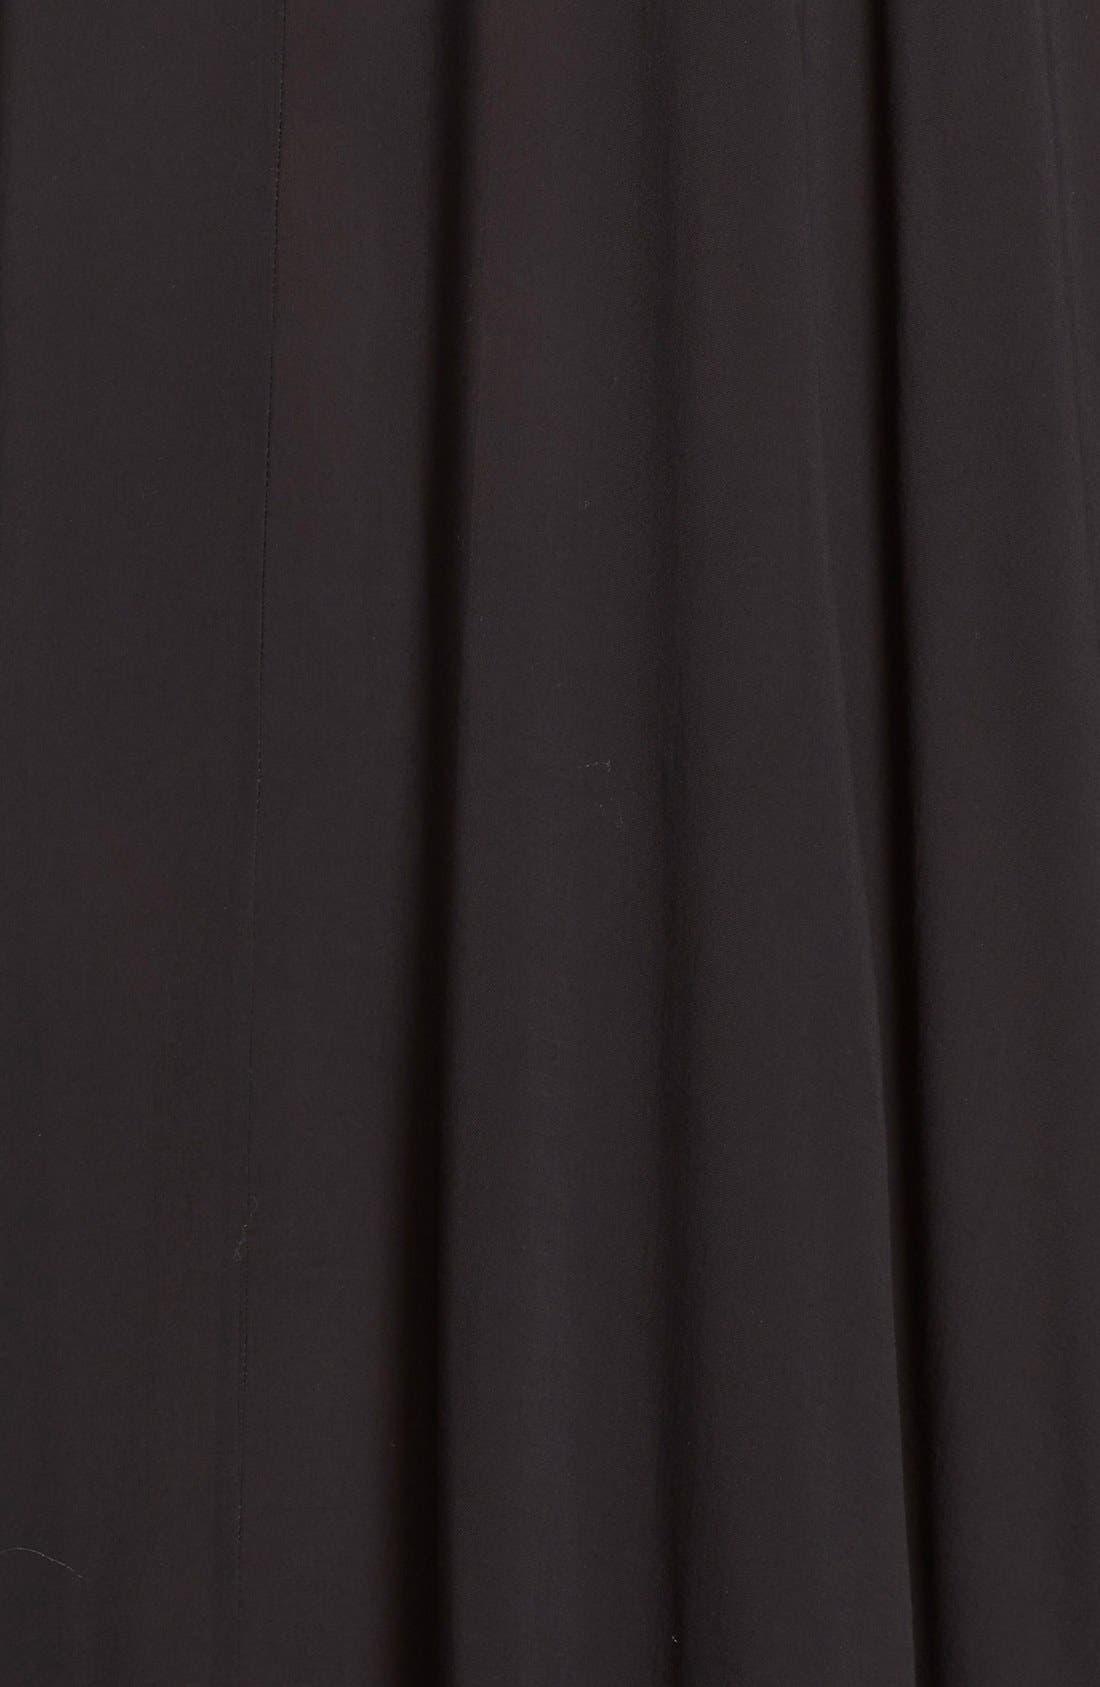 Cover-Up Maxi Dress,                             Alternate thumbnail 38, color,